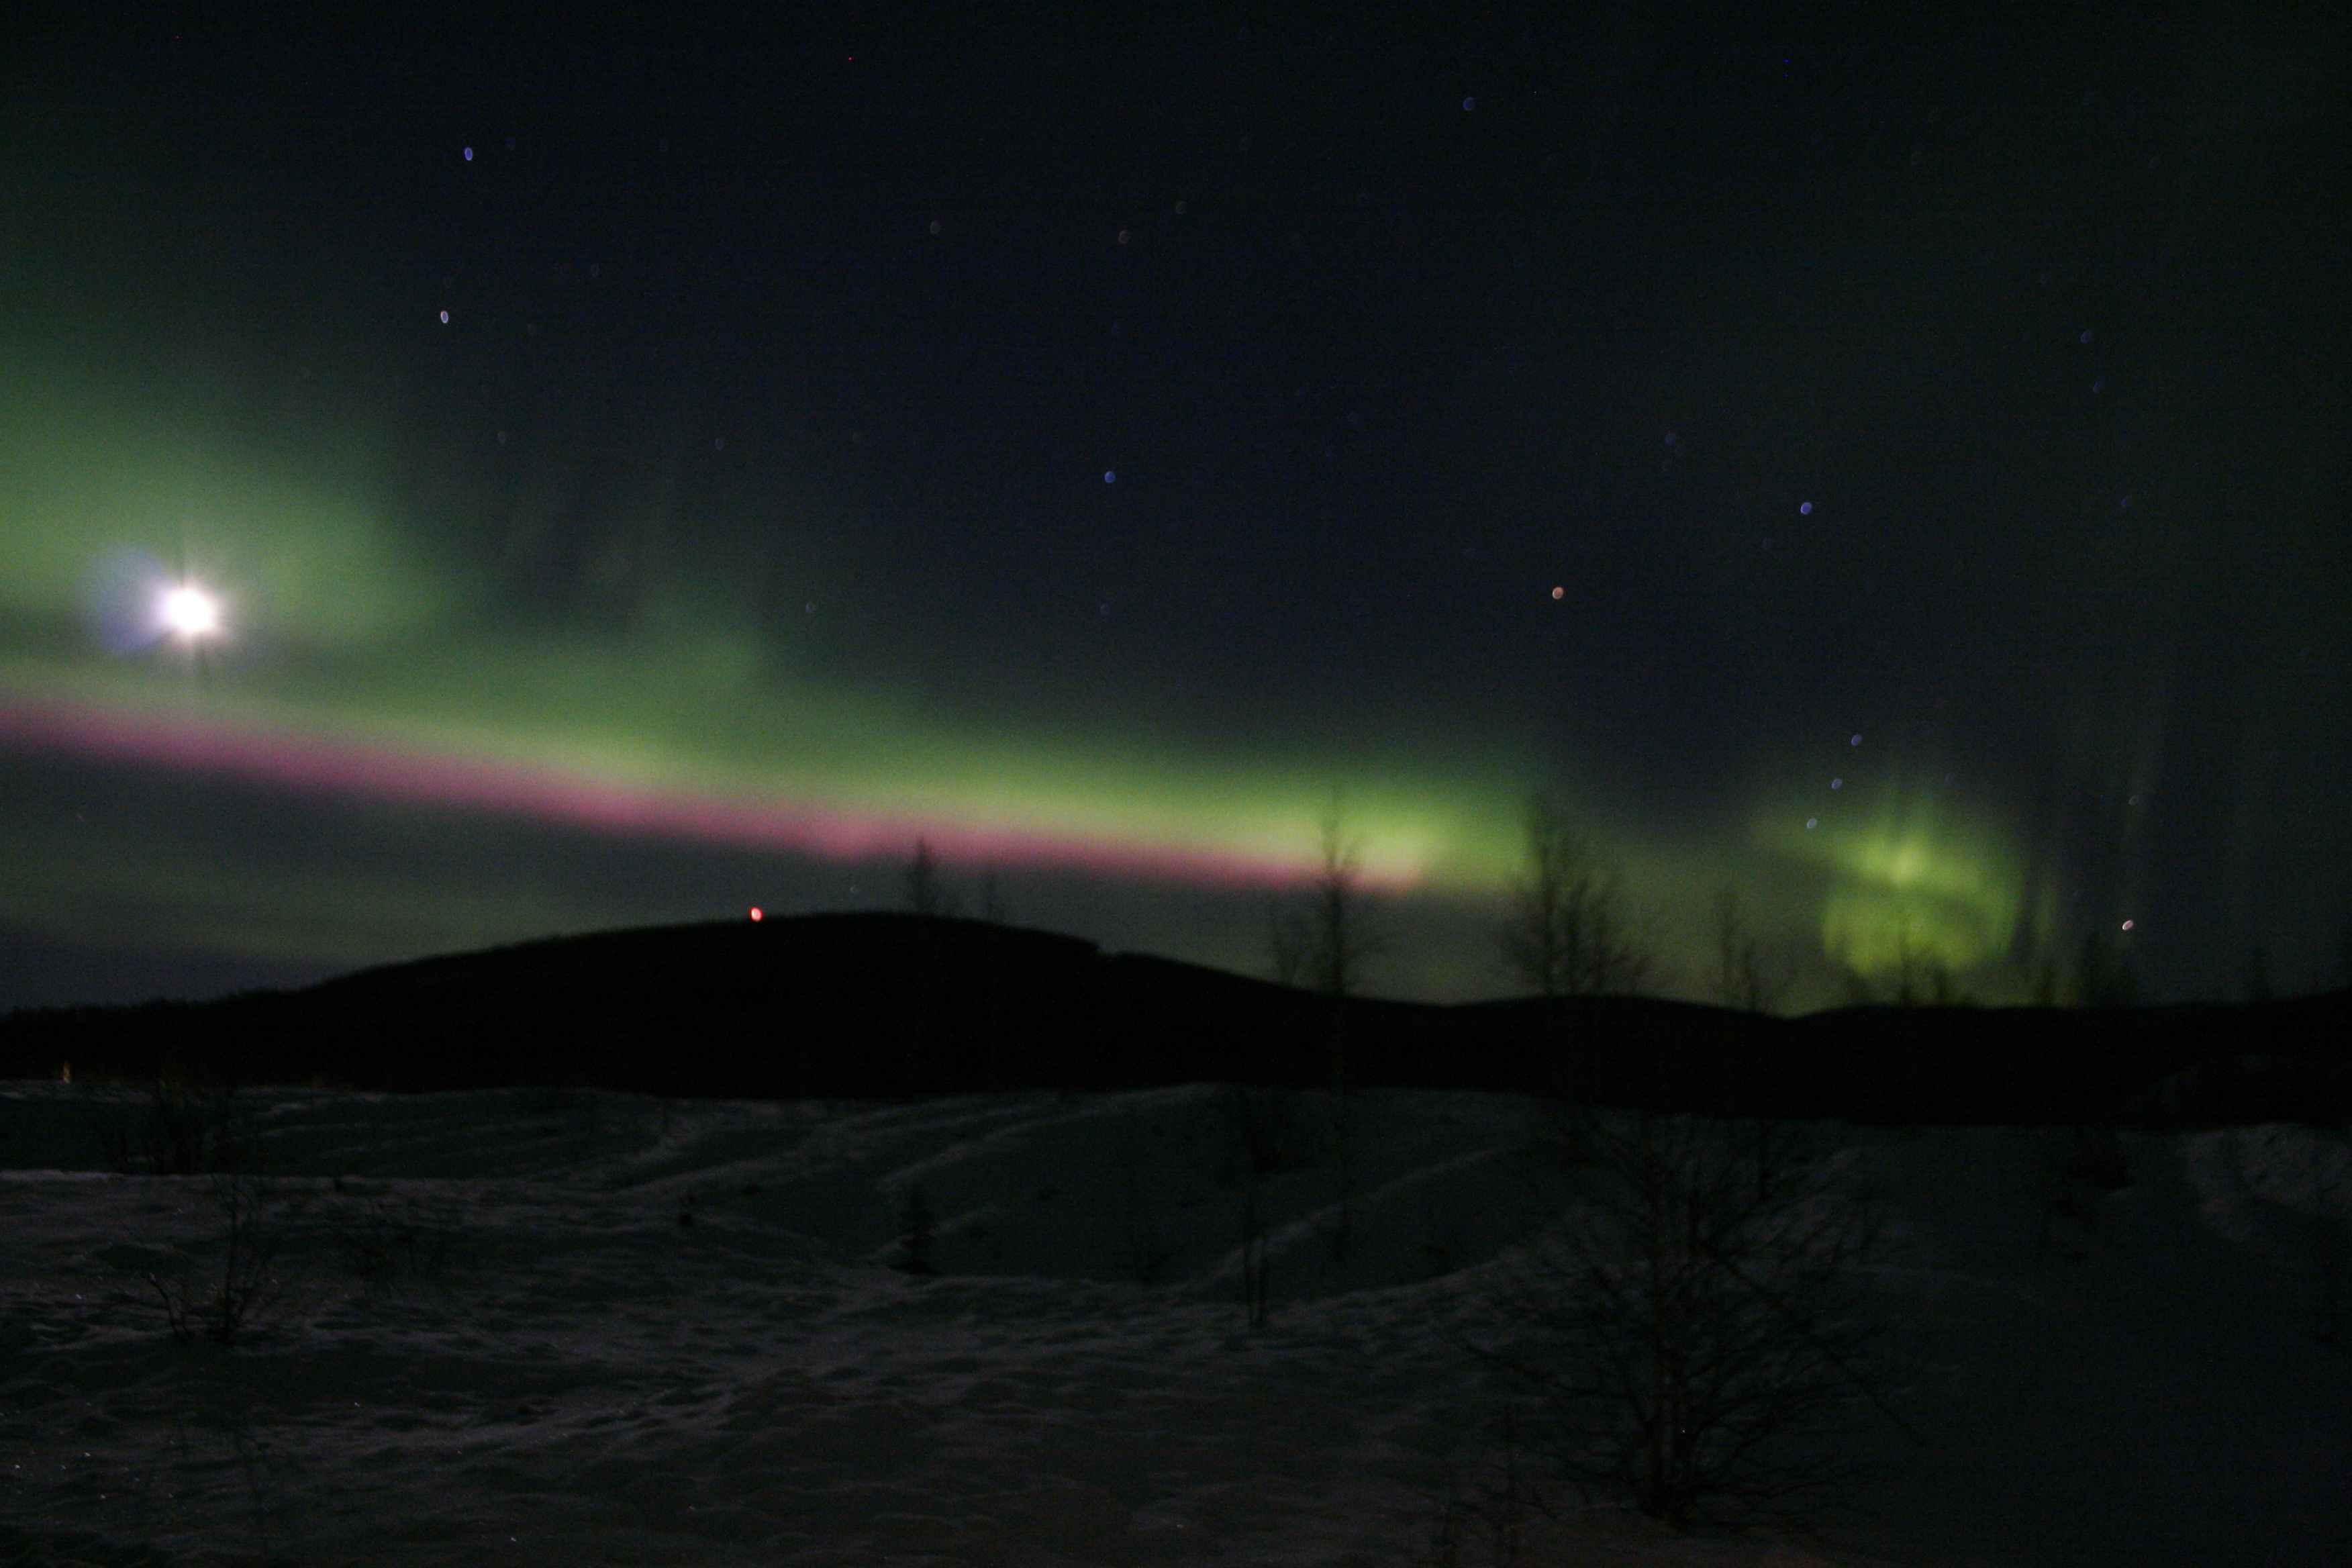 FileNorthern lights Alaska aurora borealis lights at nightg